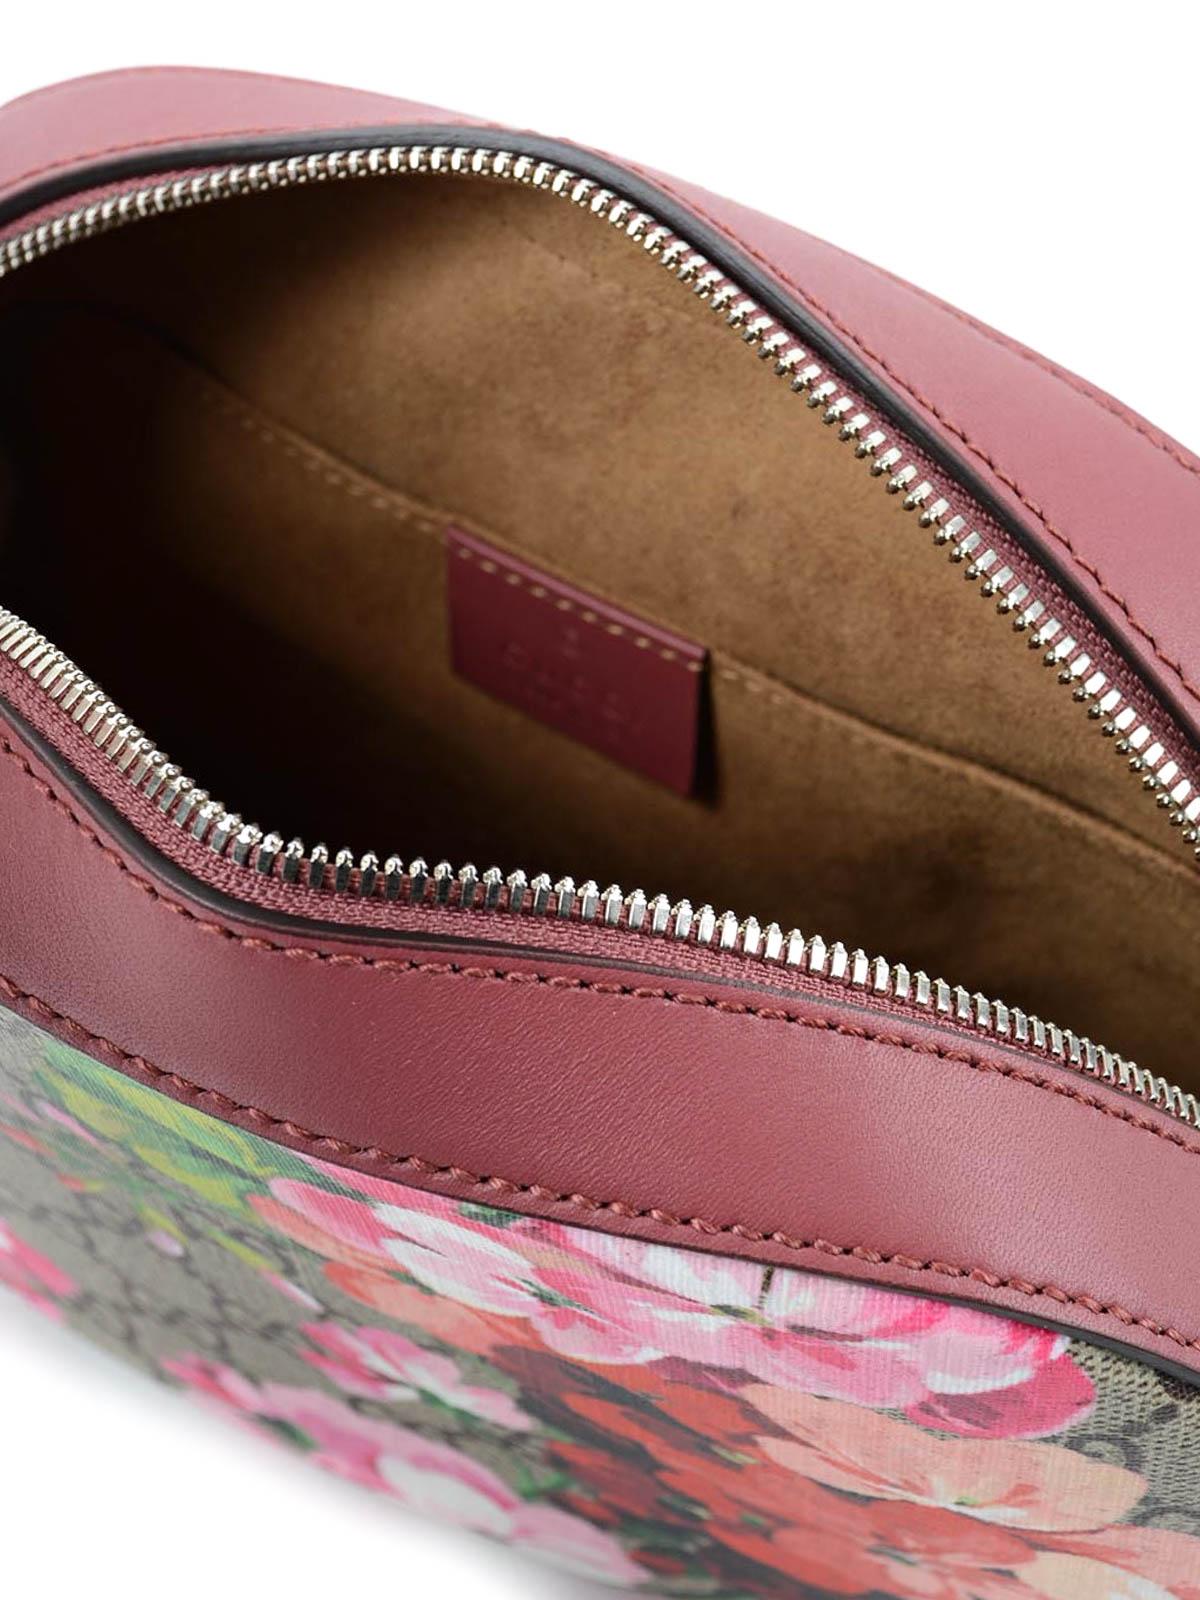 60954a7652d7 Gucci - Blooms GG supreme mini chain bag - cross body bags - 409535 ...